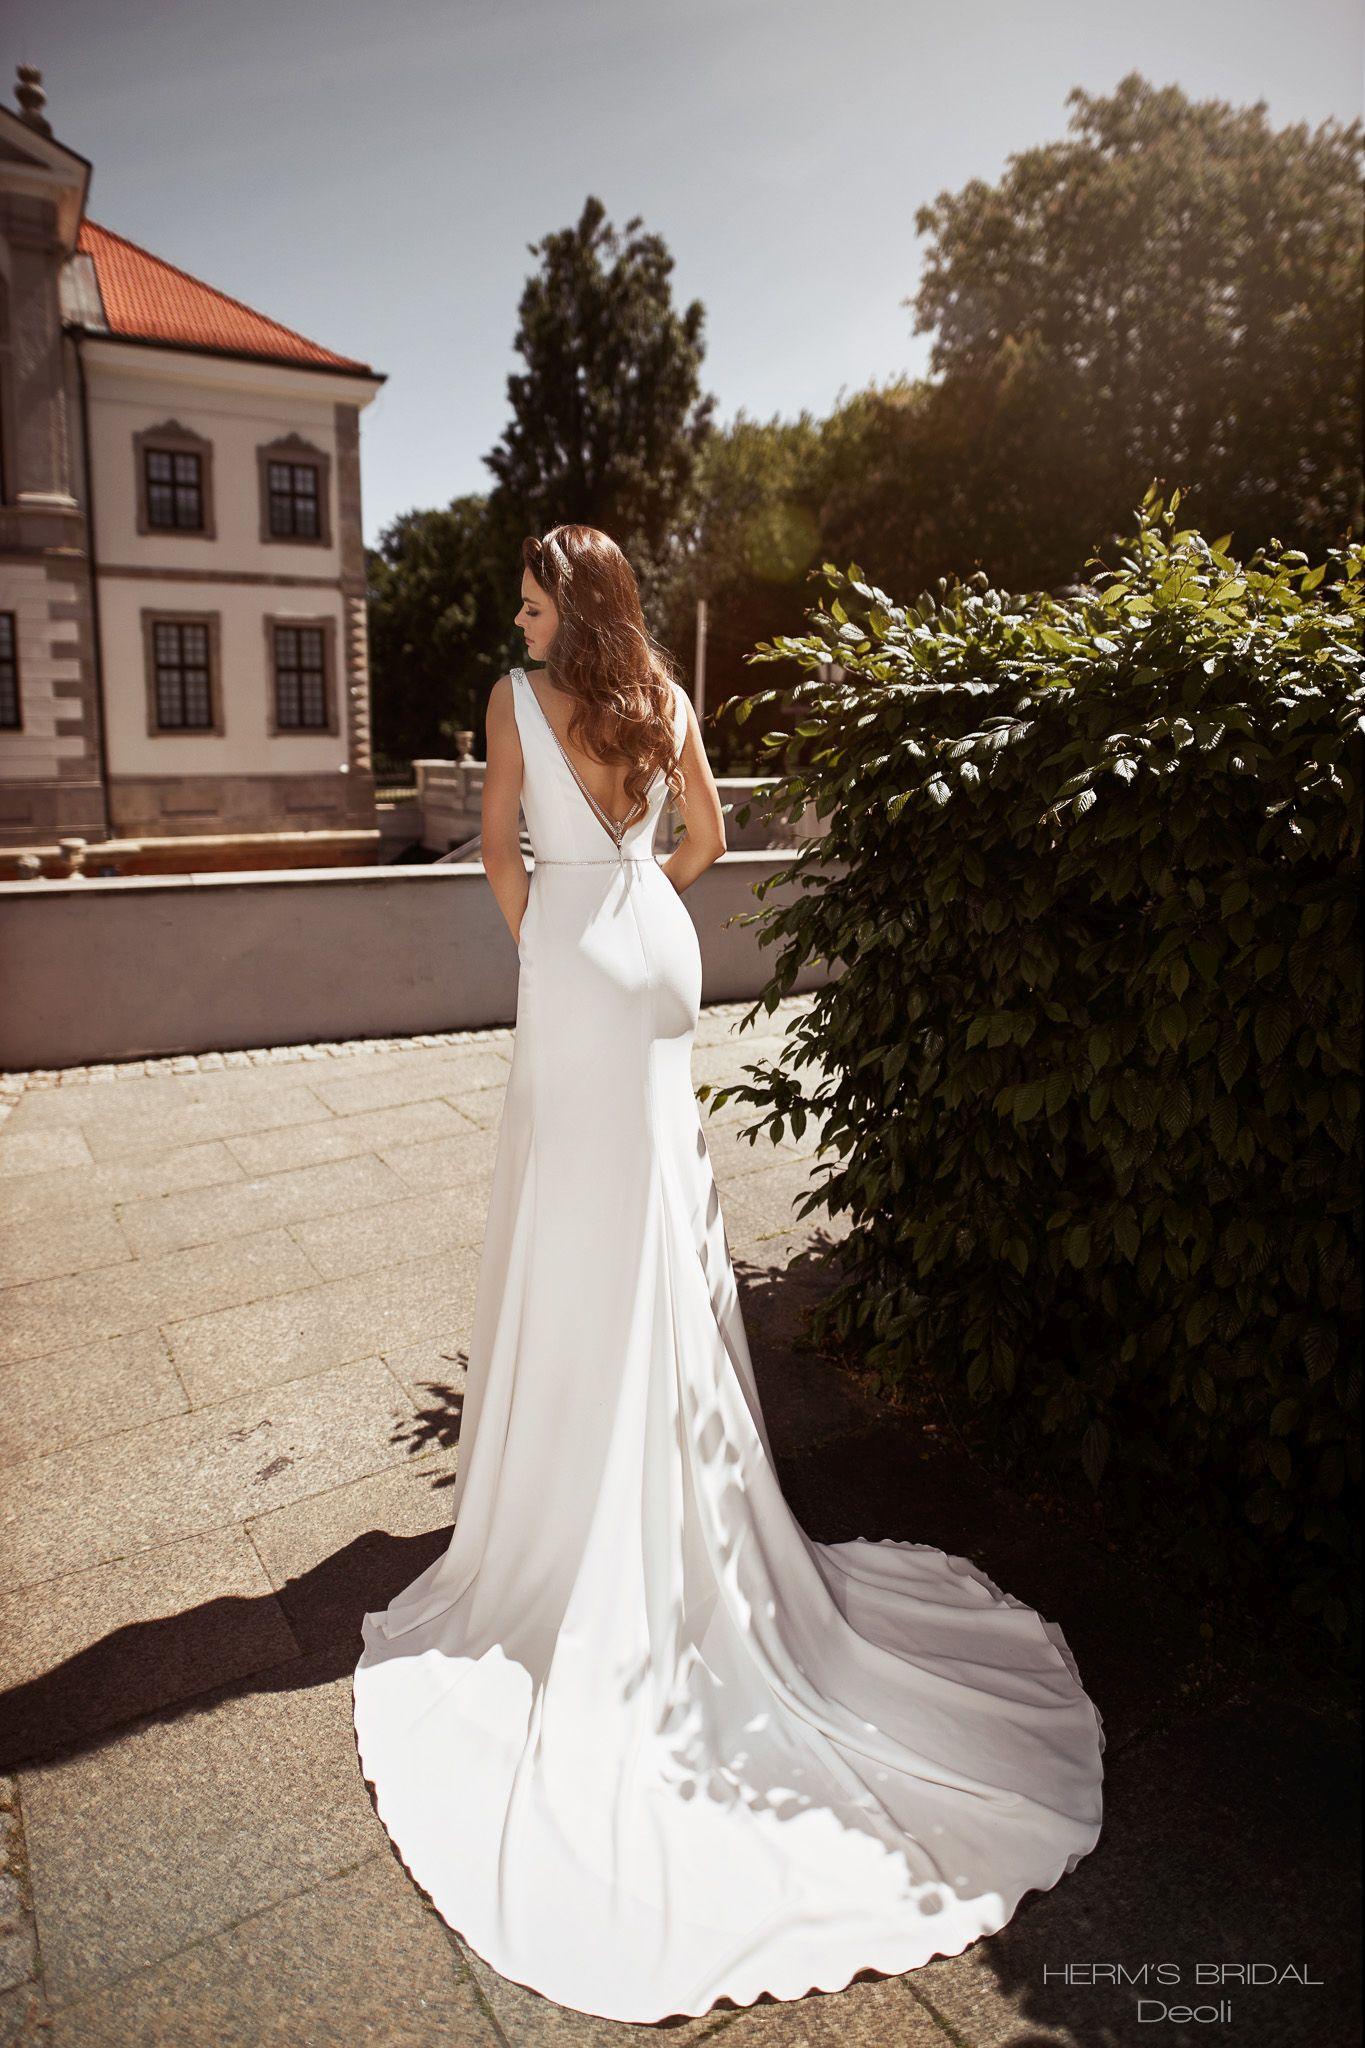 suknia slubna herms bridal Deoli 2